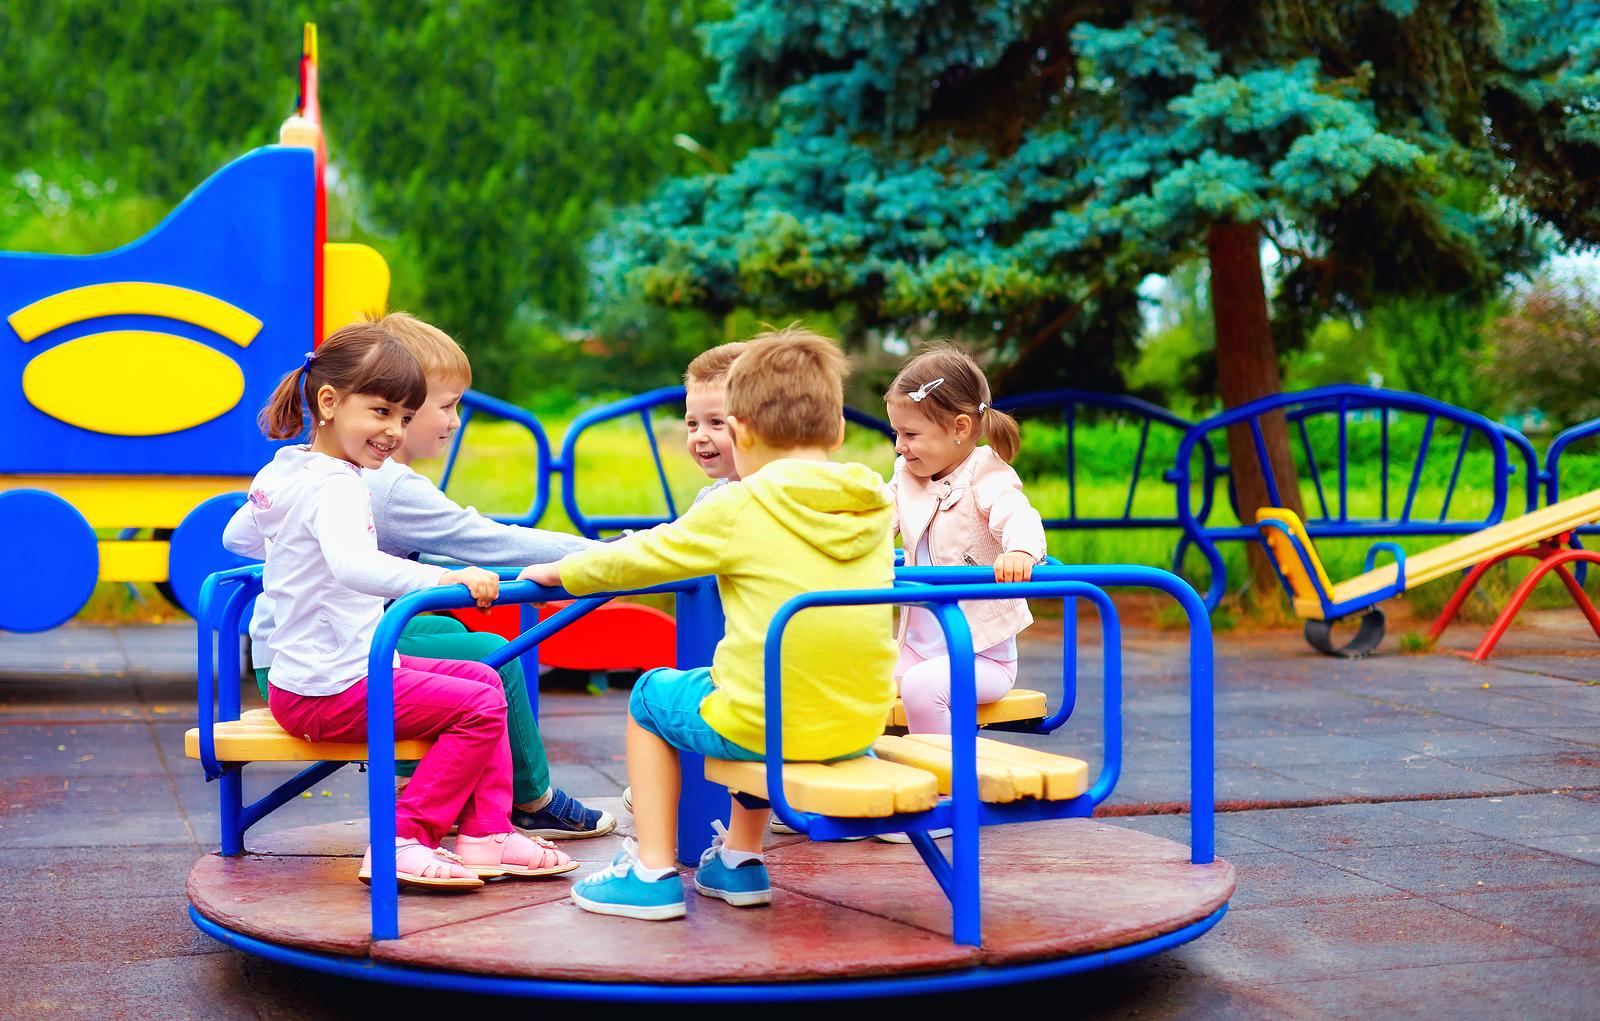 Advertising pic 5 bigstock-Group-Of-Happy-Kids-Having-Fun-129850481.jpg